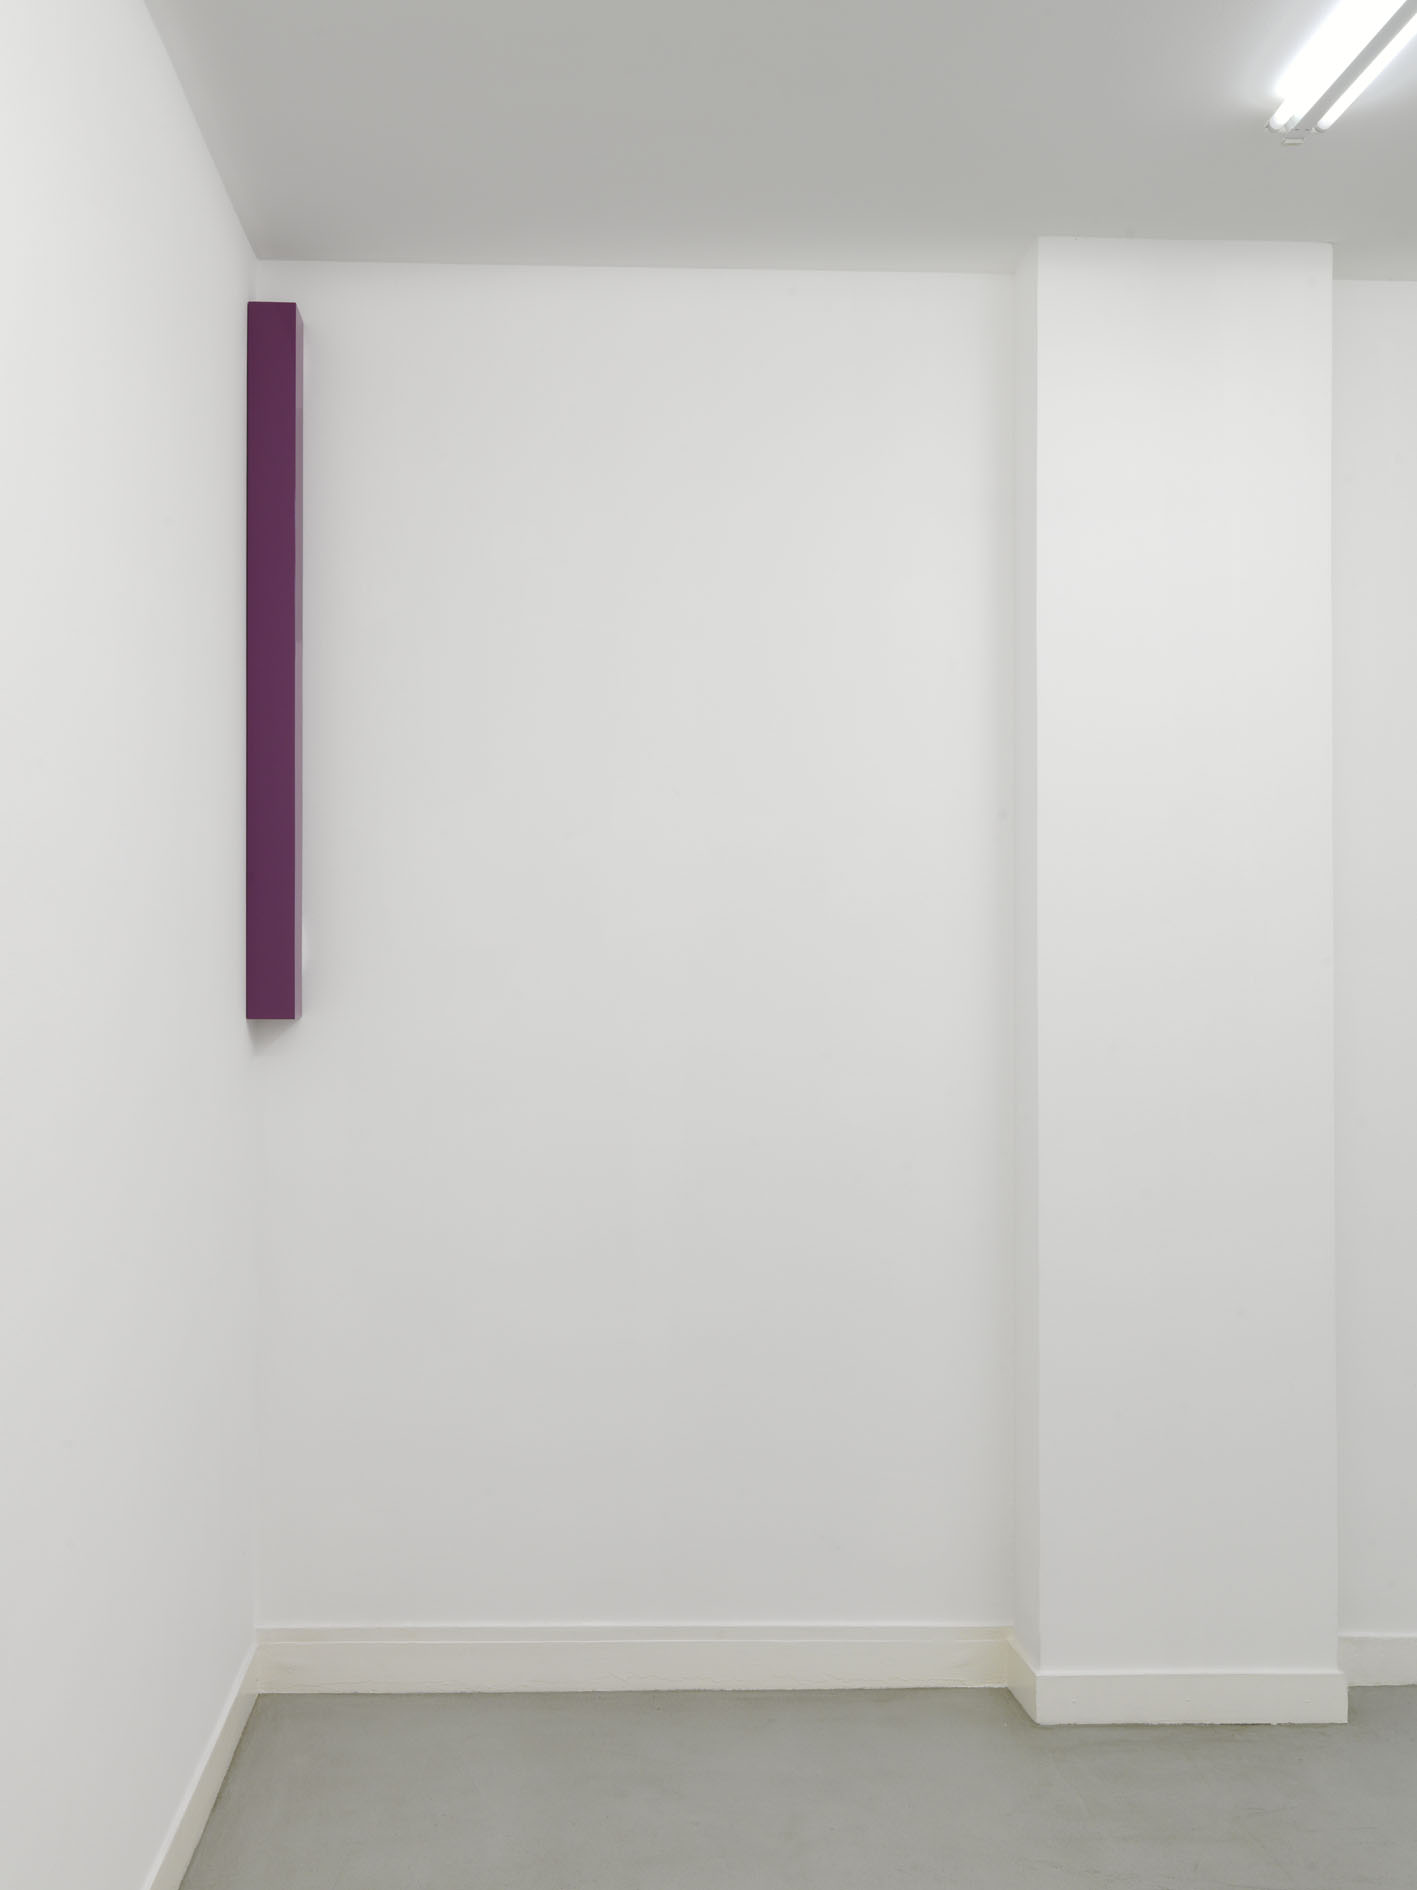 Gianni Piacentino Dark Red-Purple Small Pole III, 1966